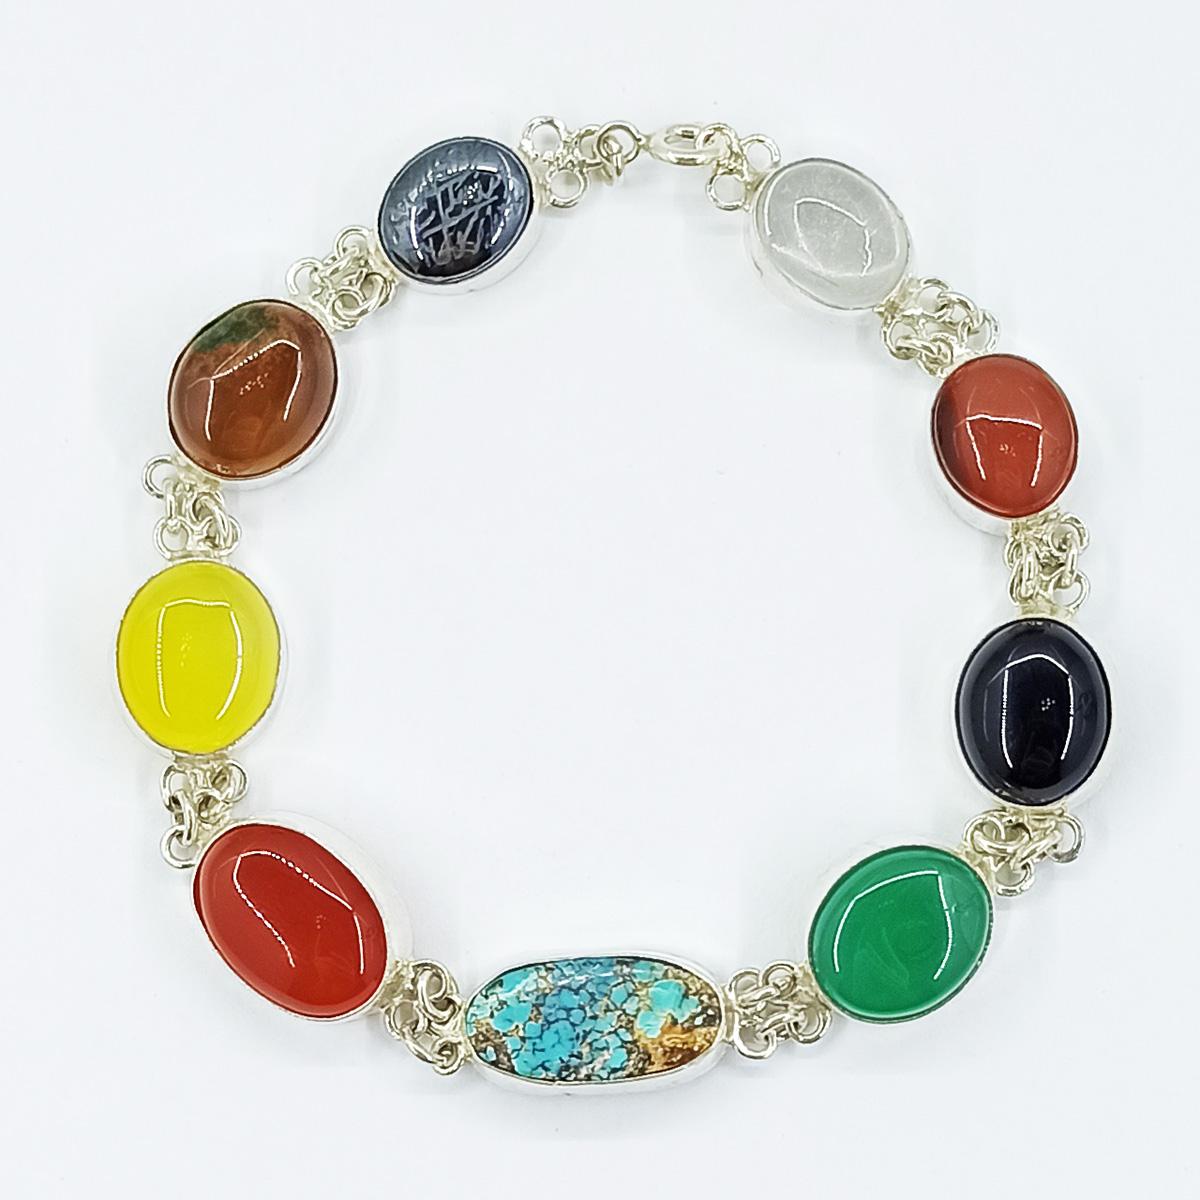 دستبند نقره زنانه سلین کالا مدل جواهری ce-As117